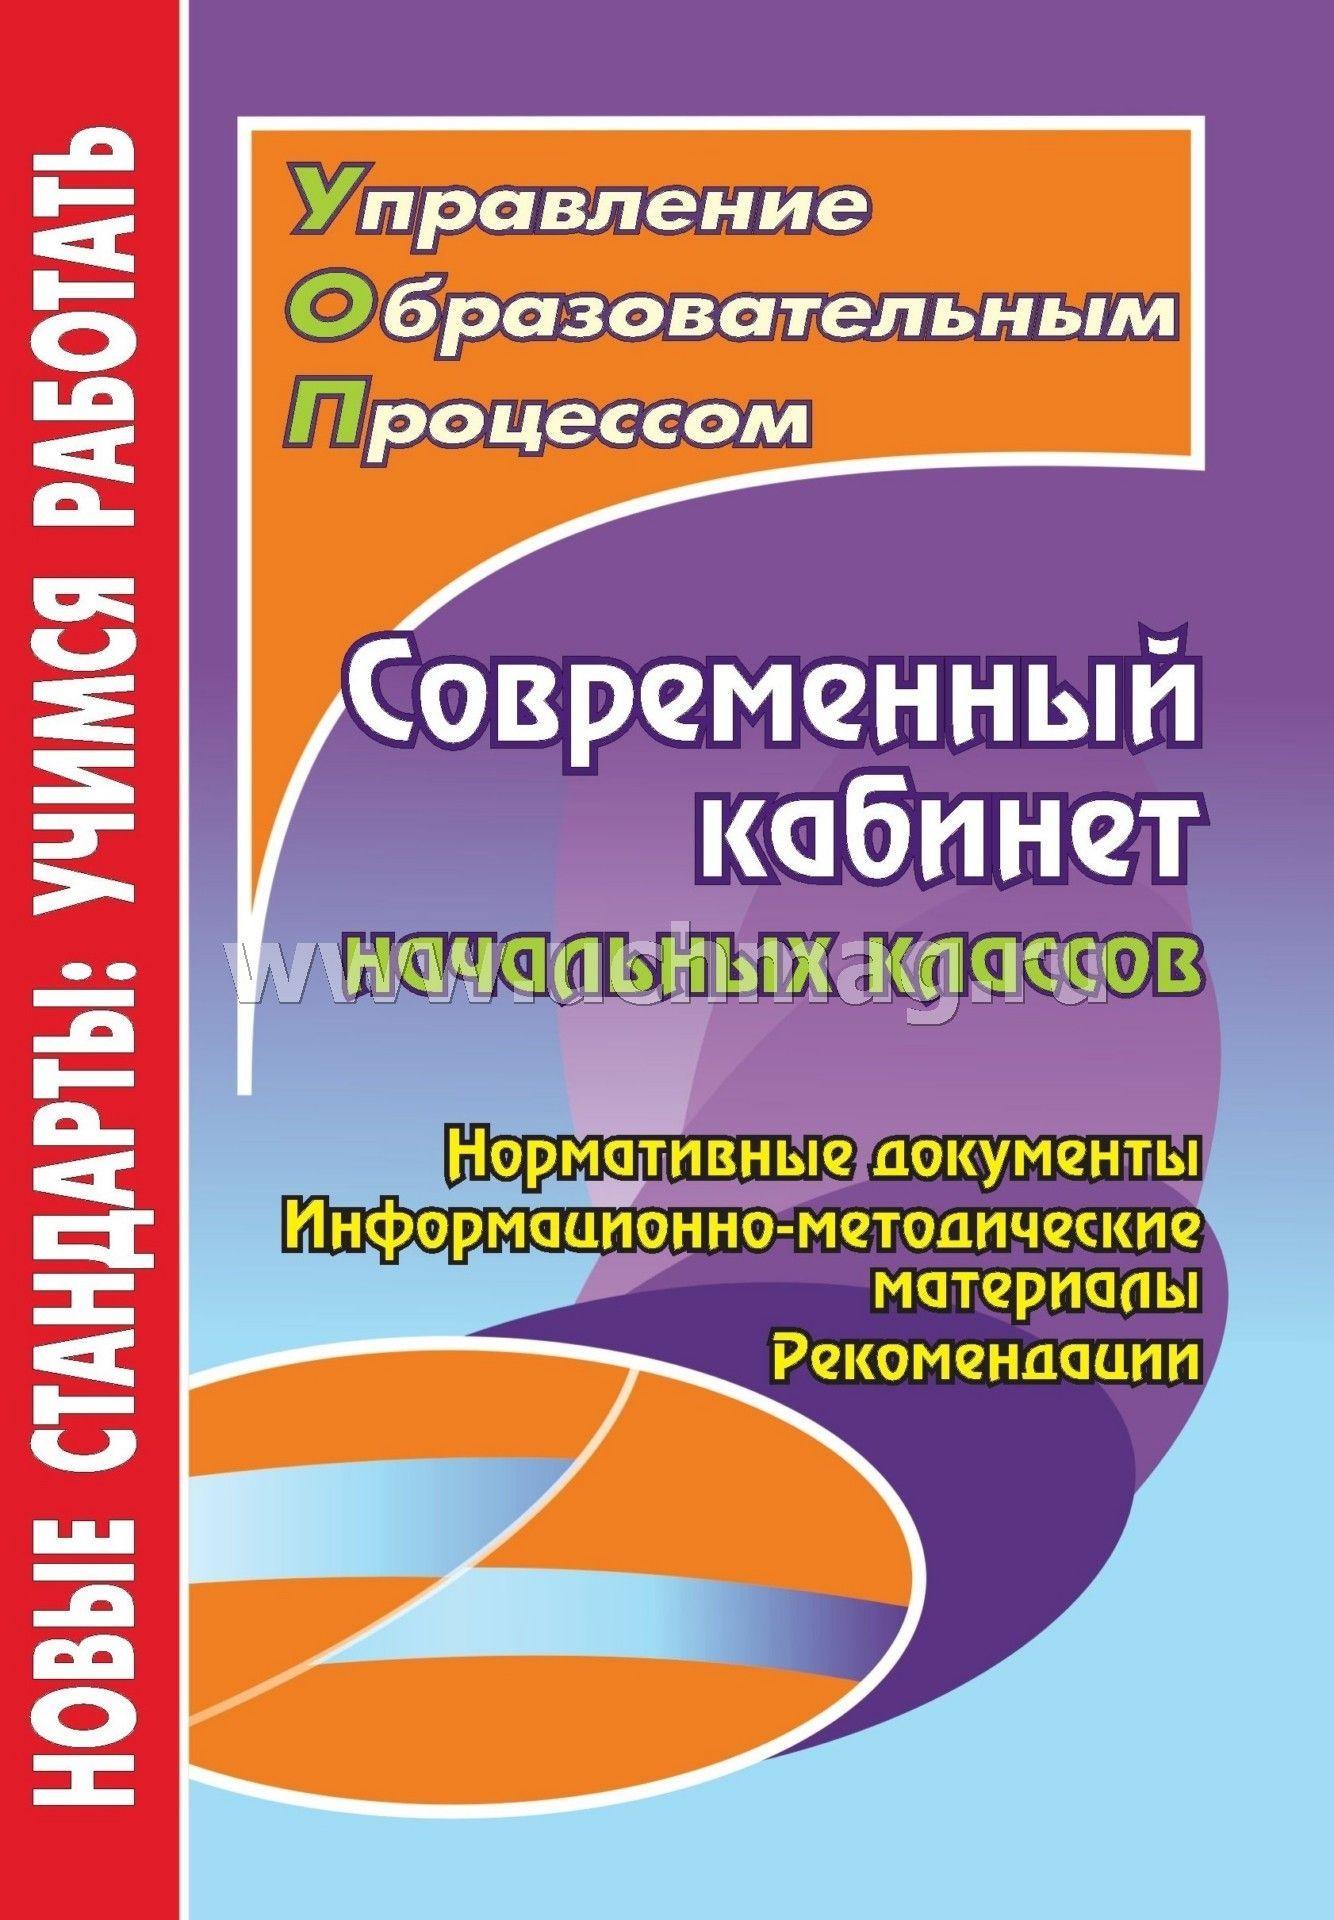 Учебник по биологии 10 класс онлайн пономарево